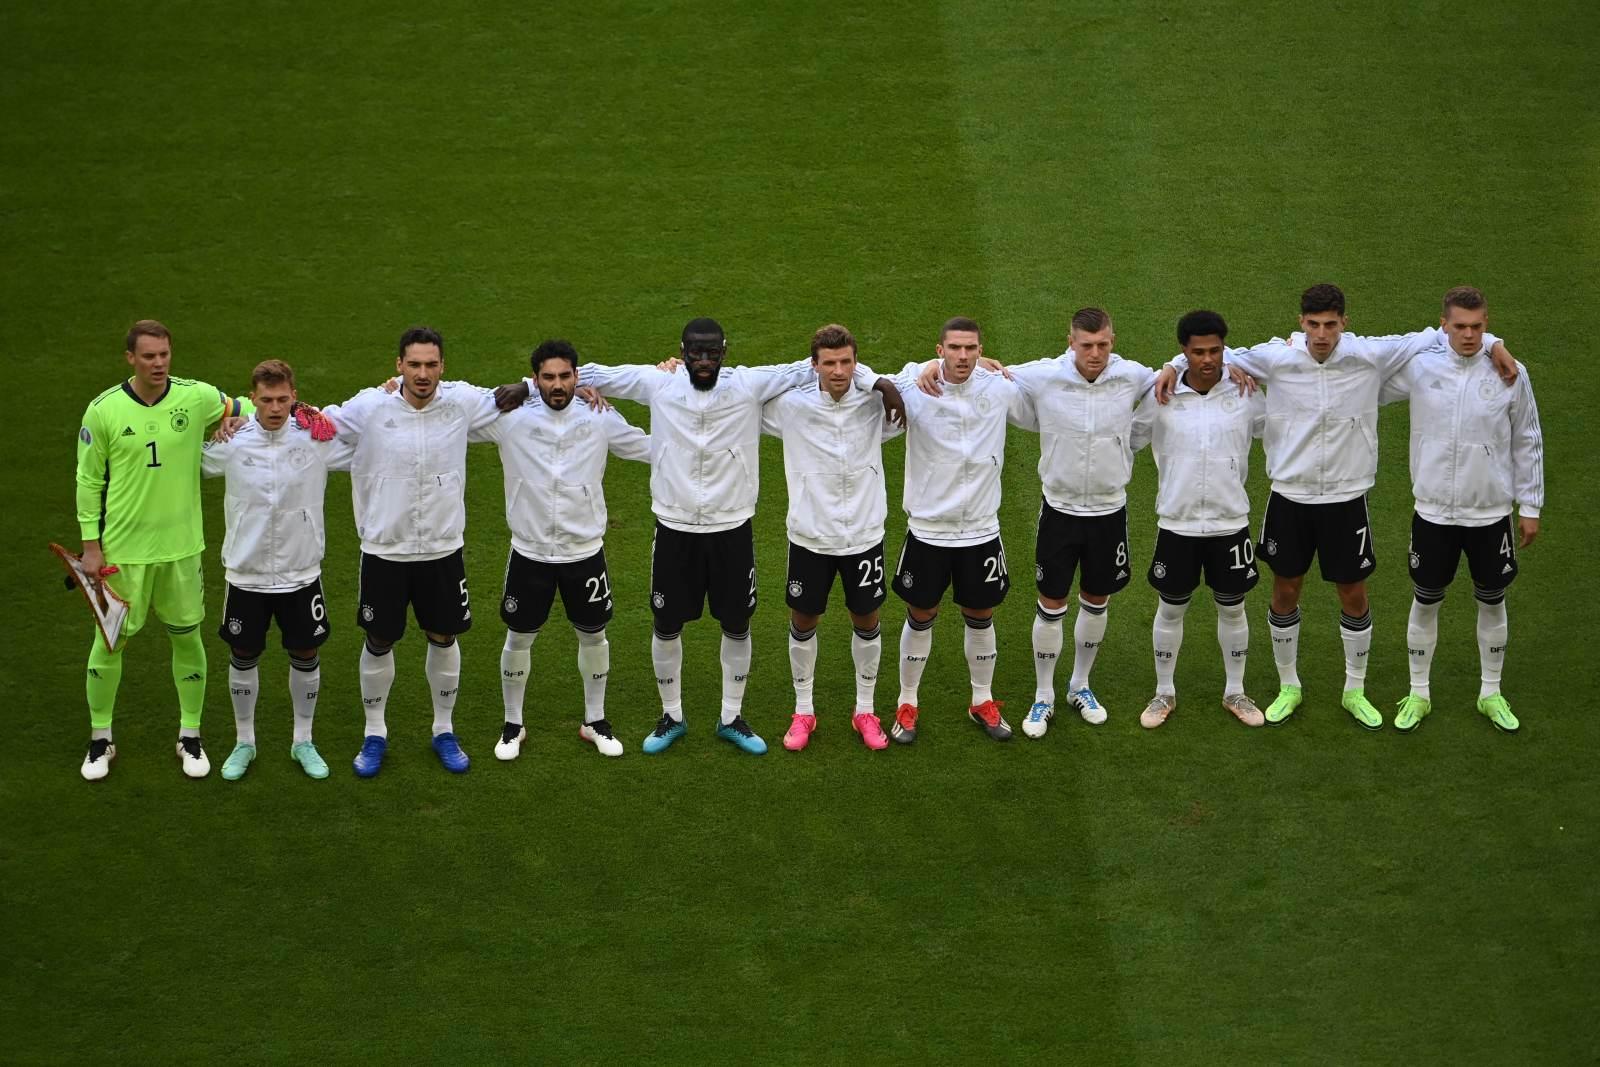 Германия - Венгрия - 2:2 (закончен)